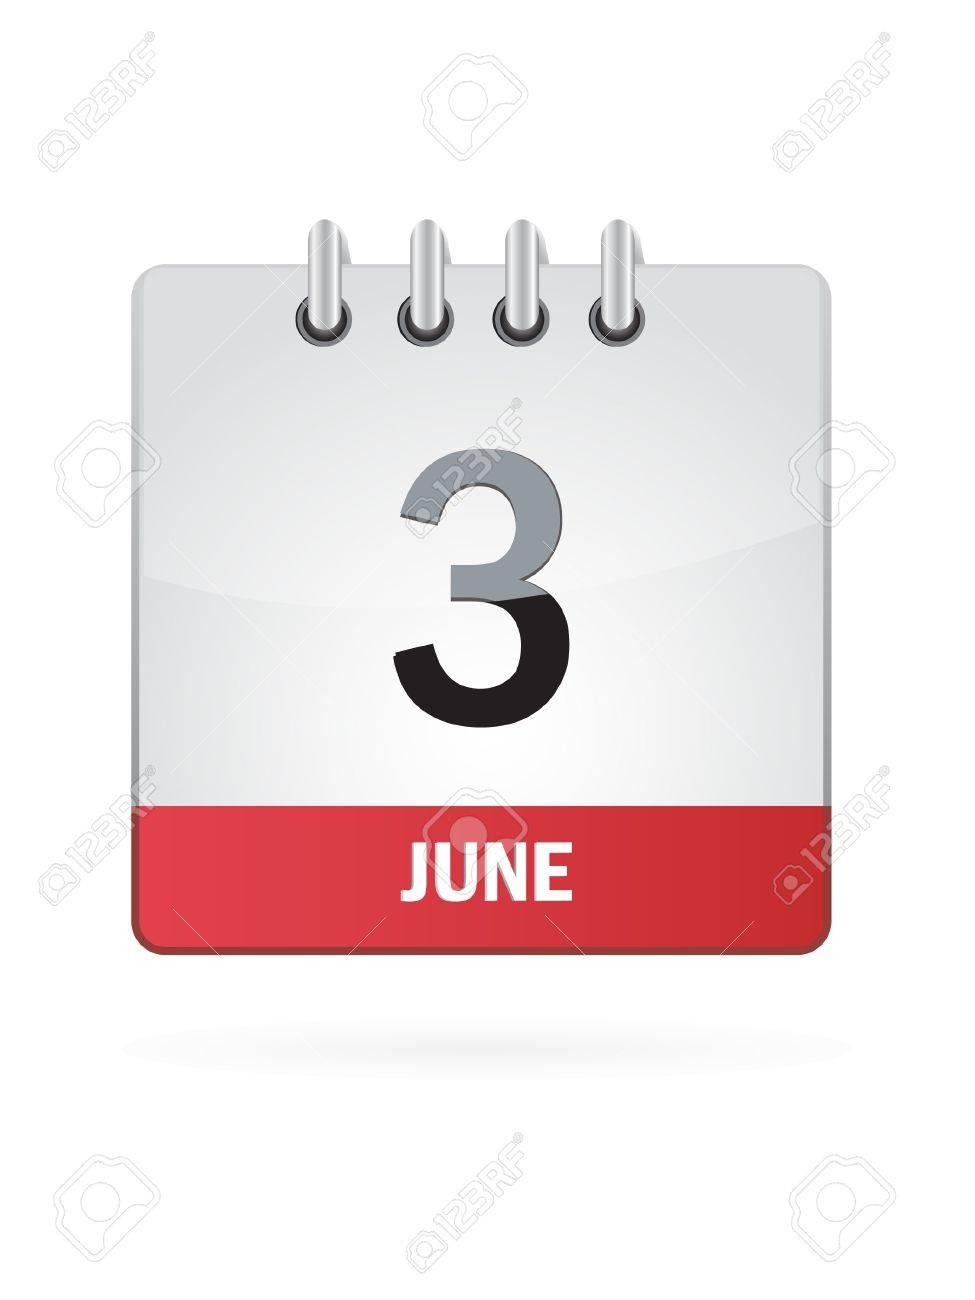 3 June Calendar Icon On White Background Stock Vector - 18456983